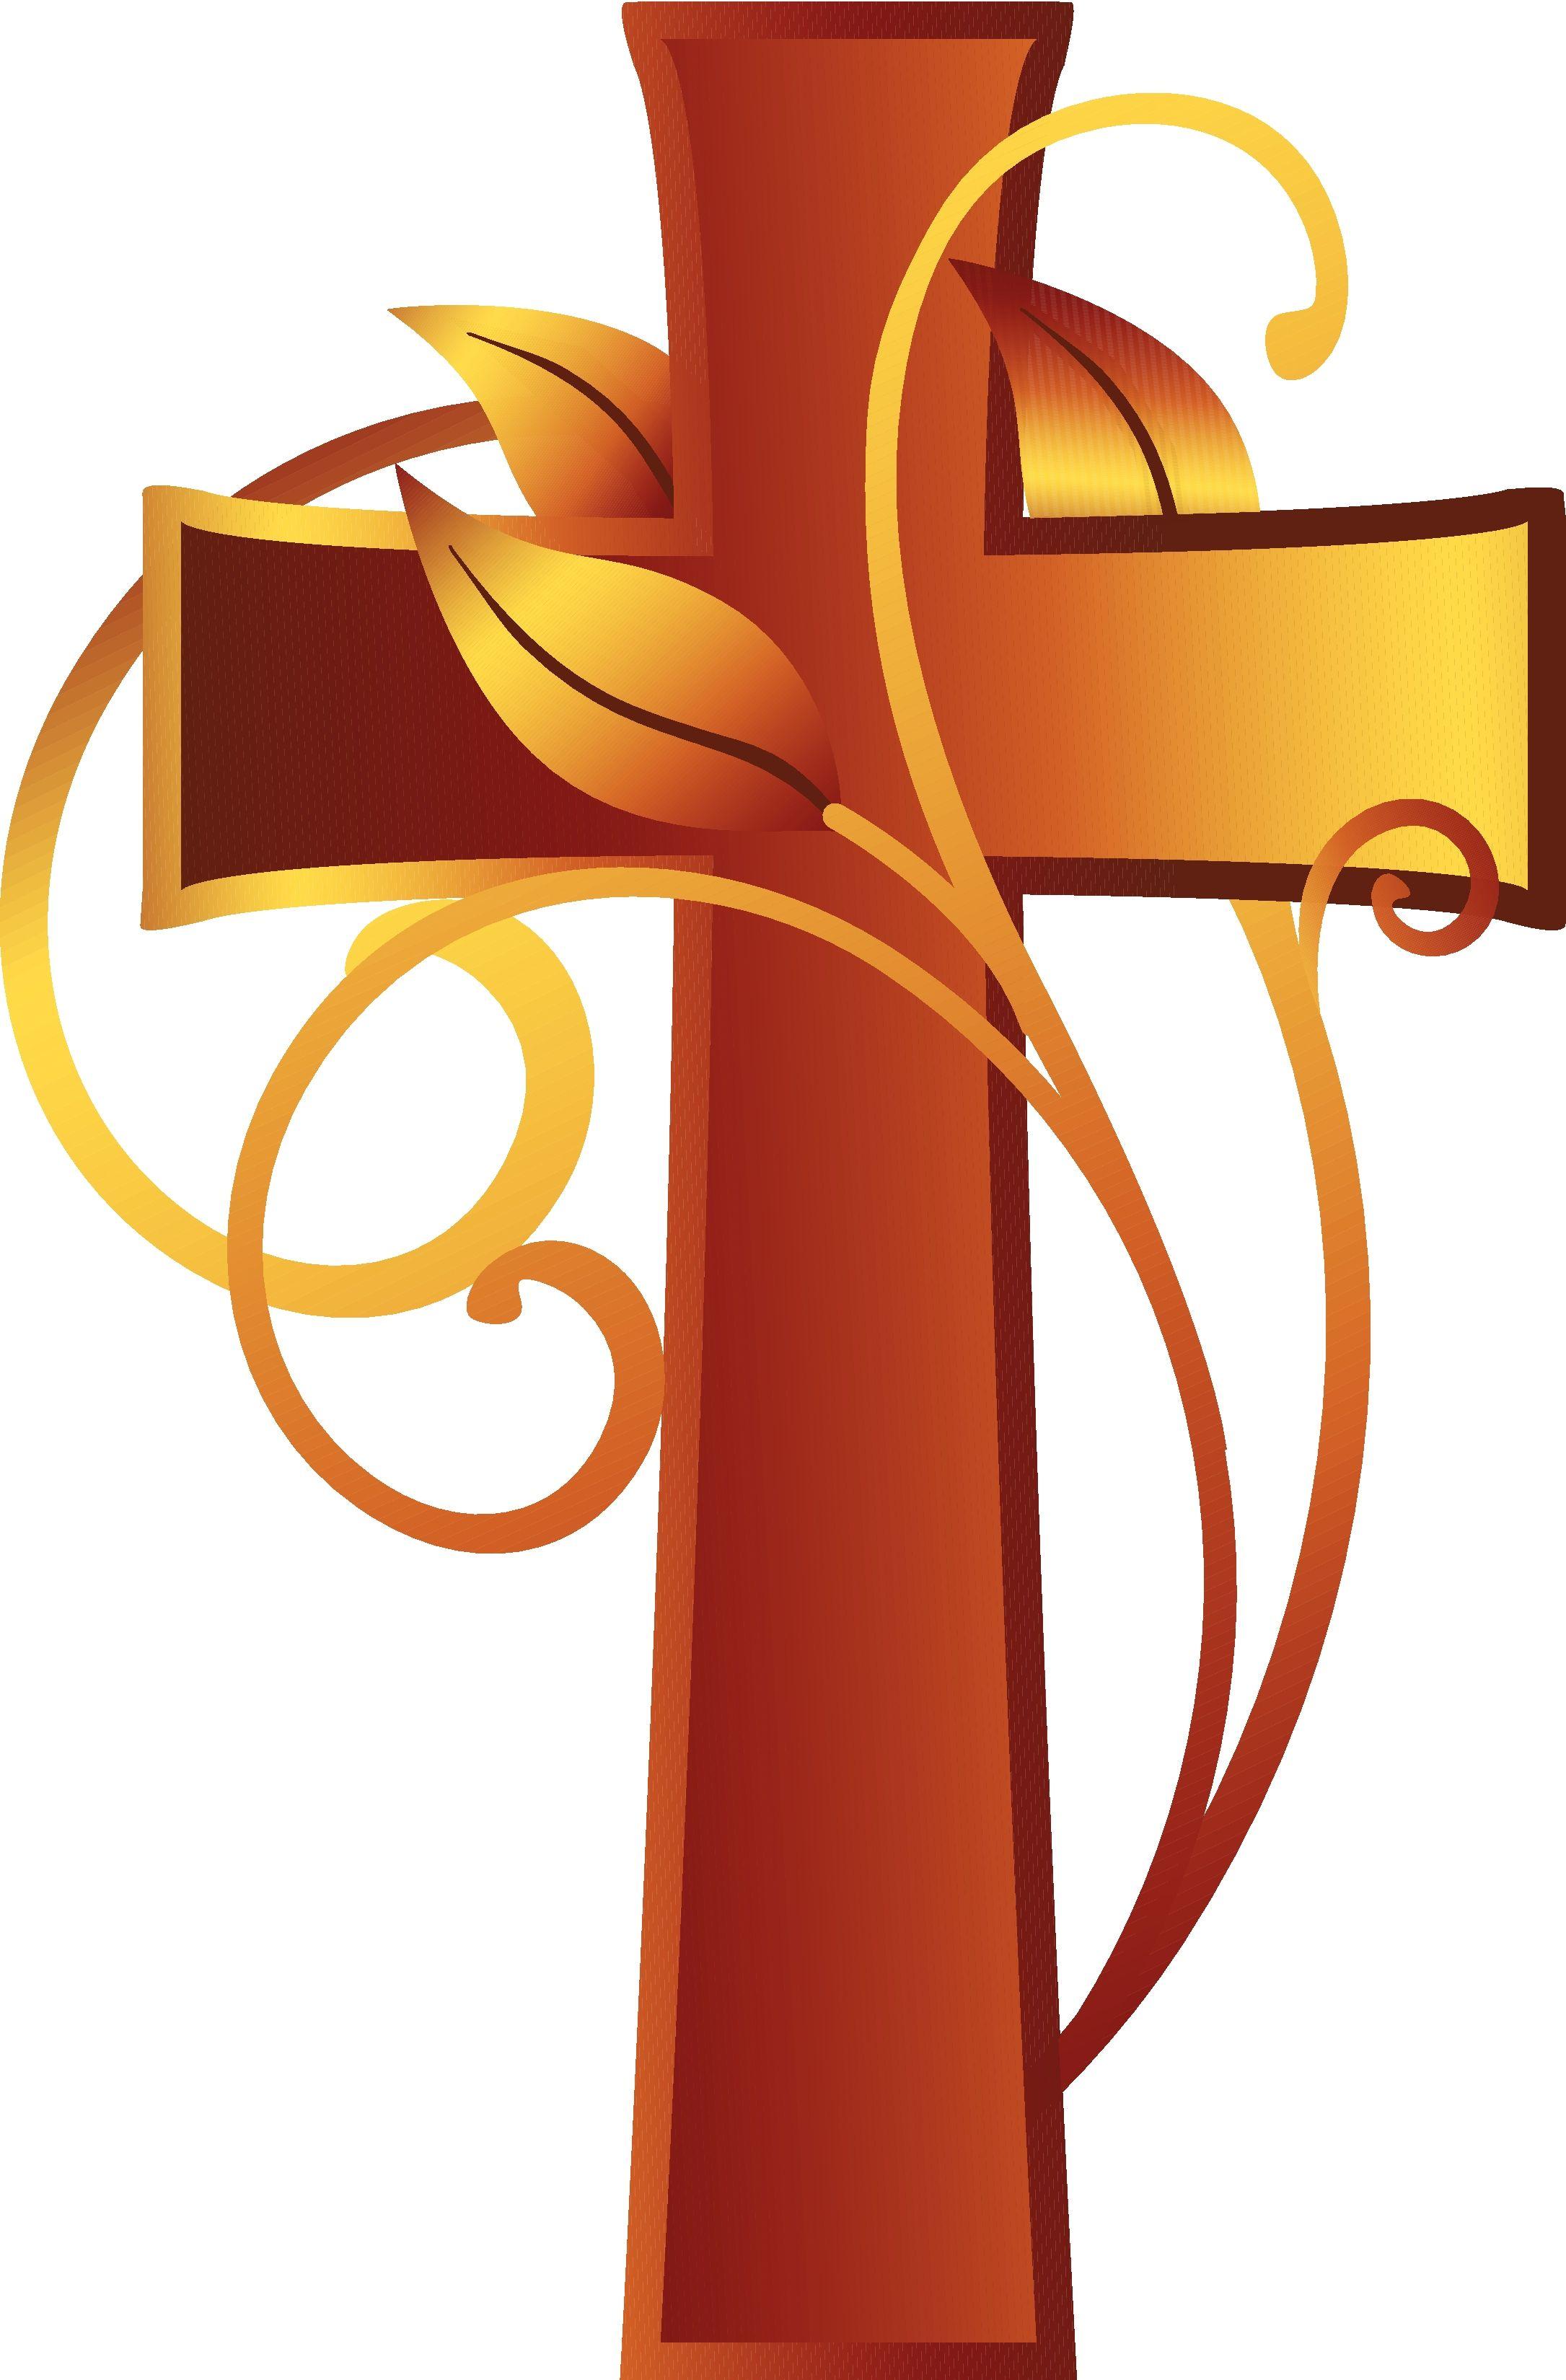 Clipart crosses free religious svg black and white stock clip art crosses free | The Christian and The Pagan » Walking in the ... svg black and white stock